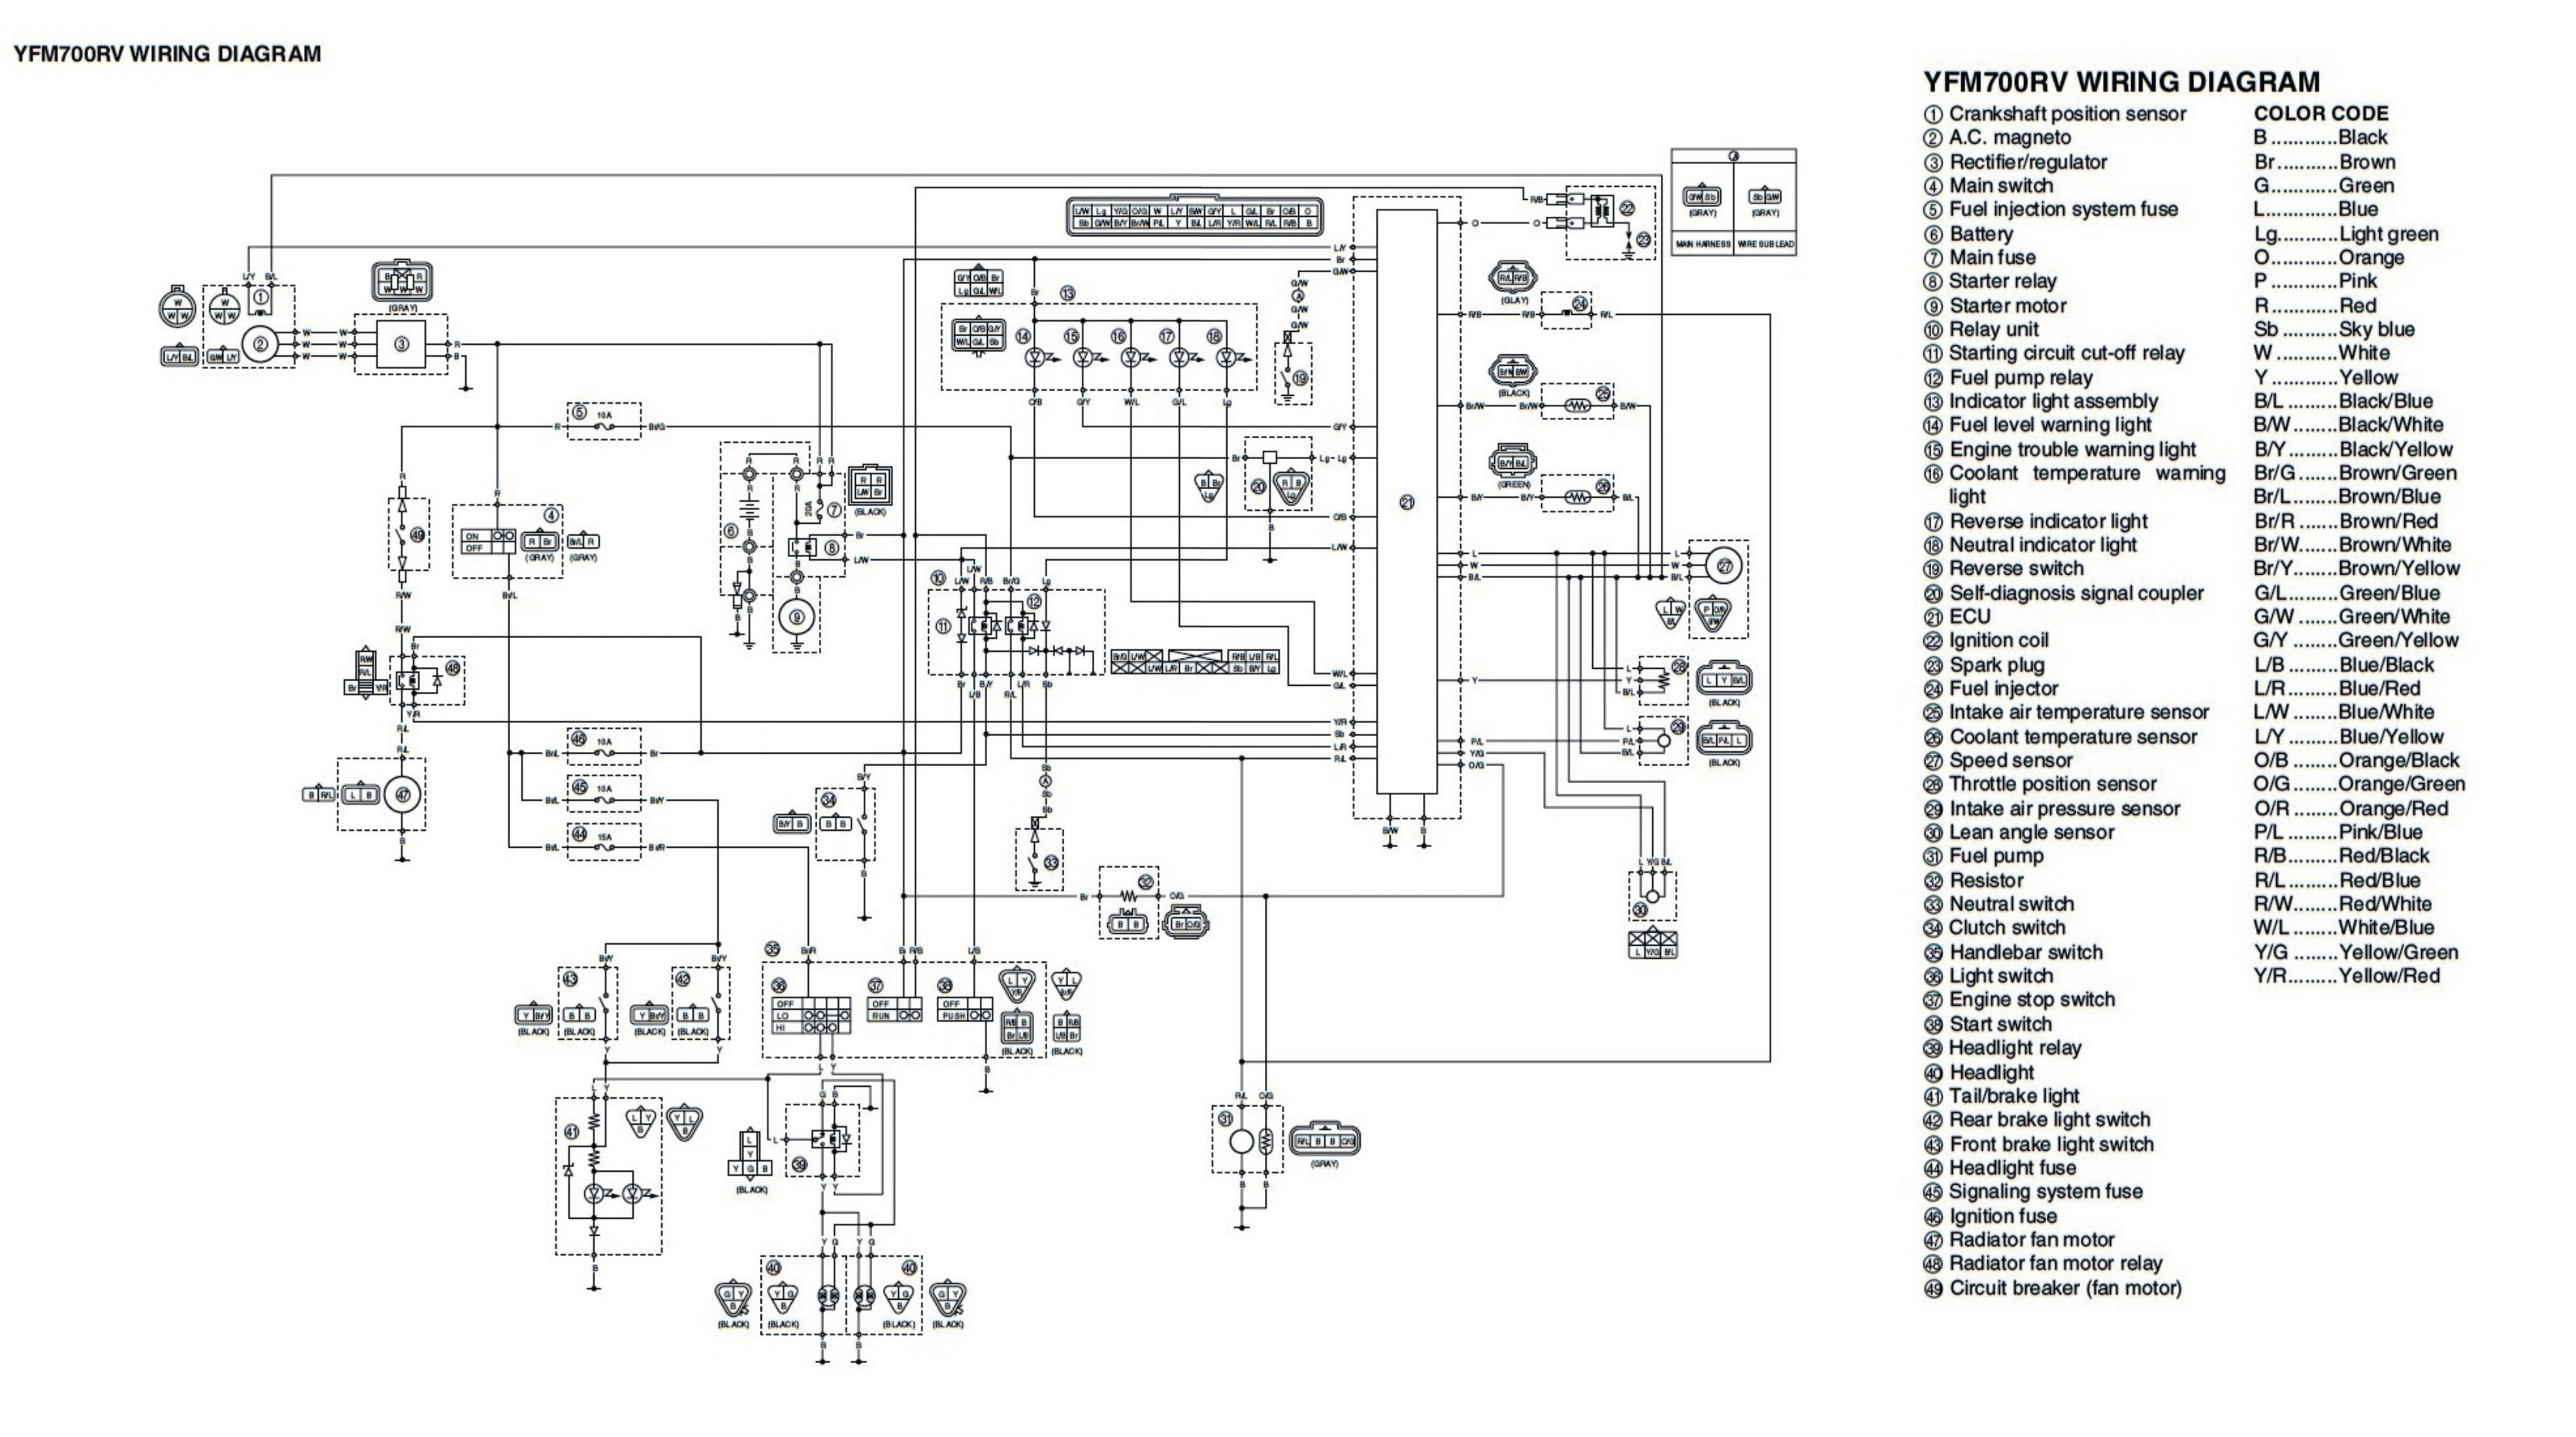 Random Yamaha Outboard Wiring Harness Diagram Yamaha Outboard Wiring - Yamaha Outboard Wiring Harness Diagram